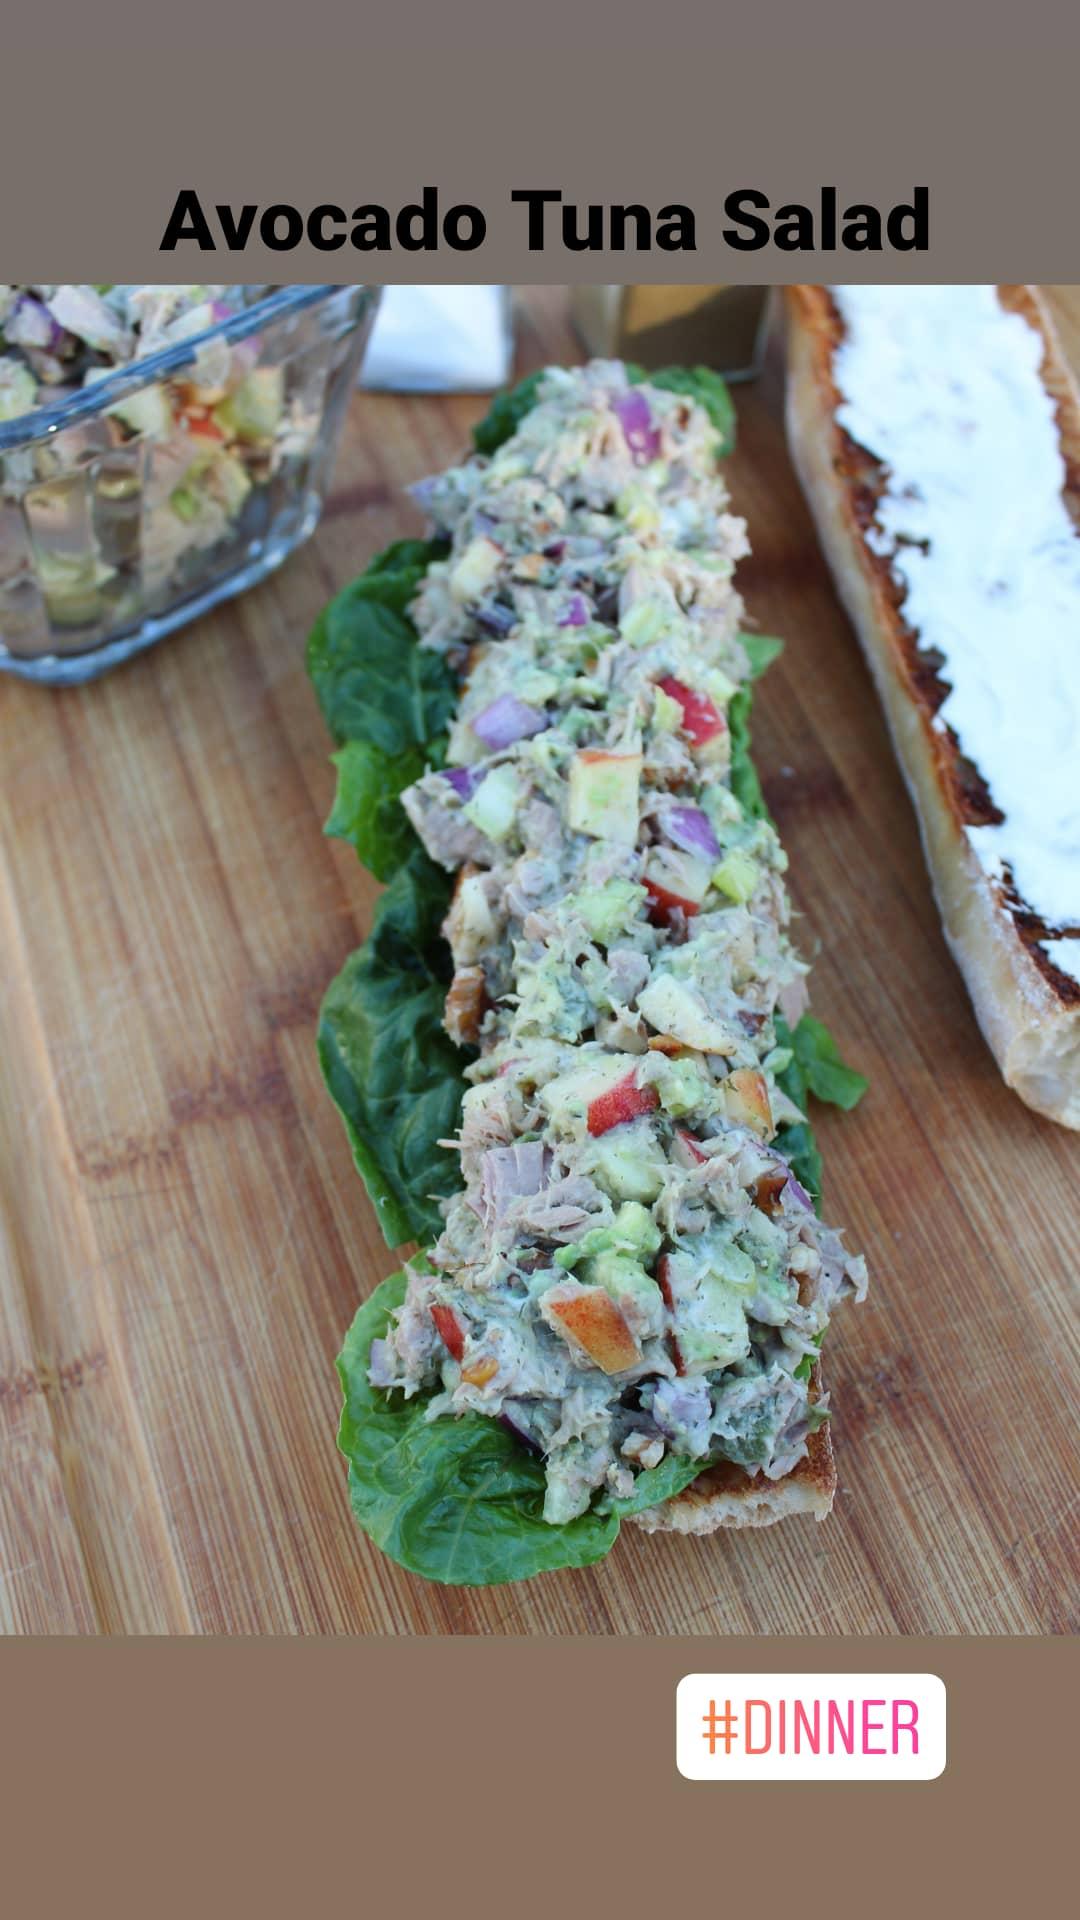 Avocado Tuna Salad image